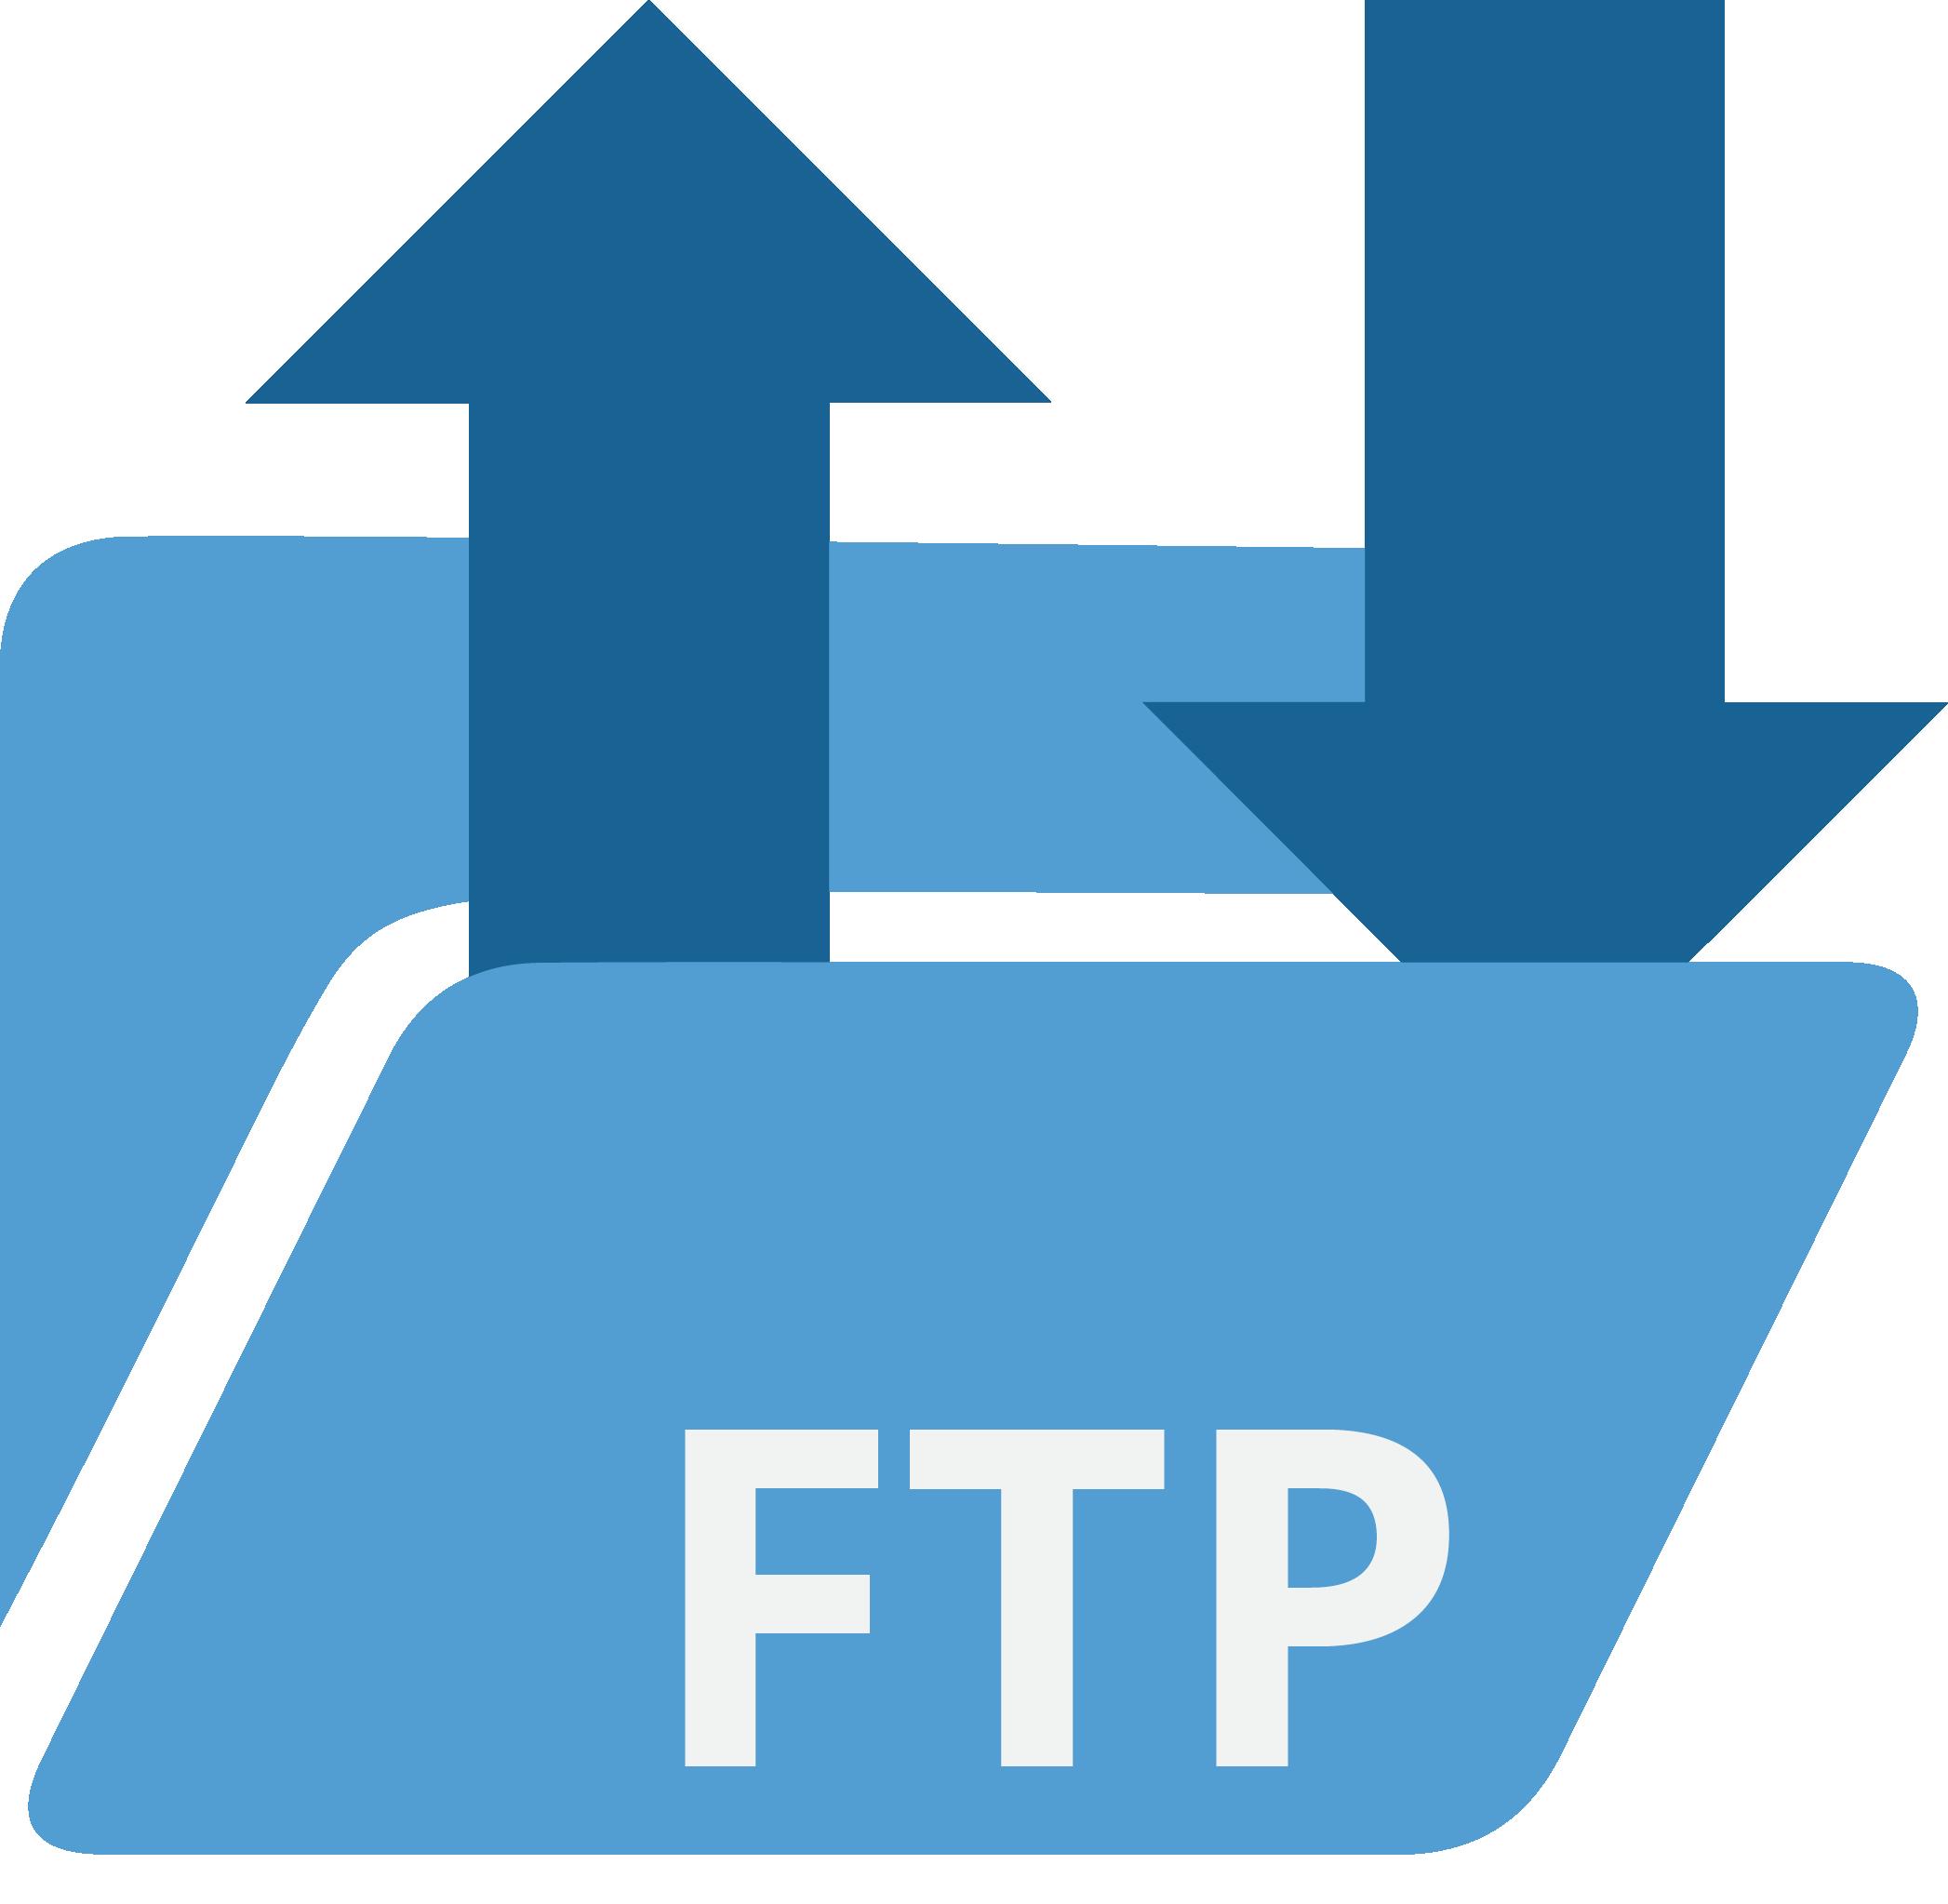 Ftp — википедия с видео // wiki 2